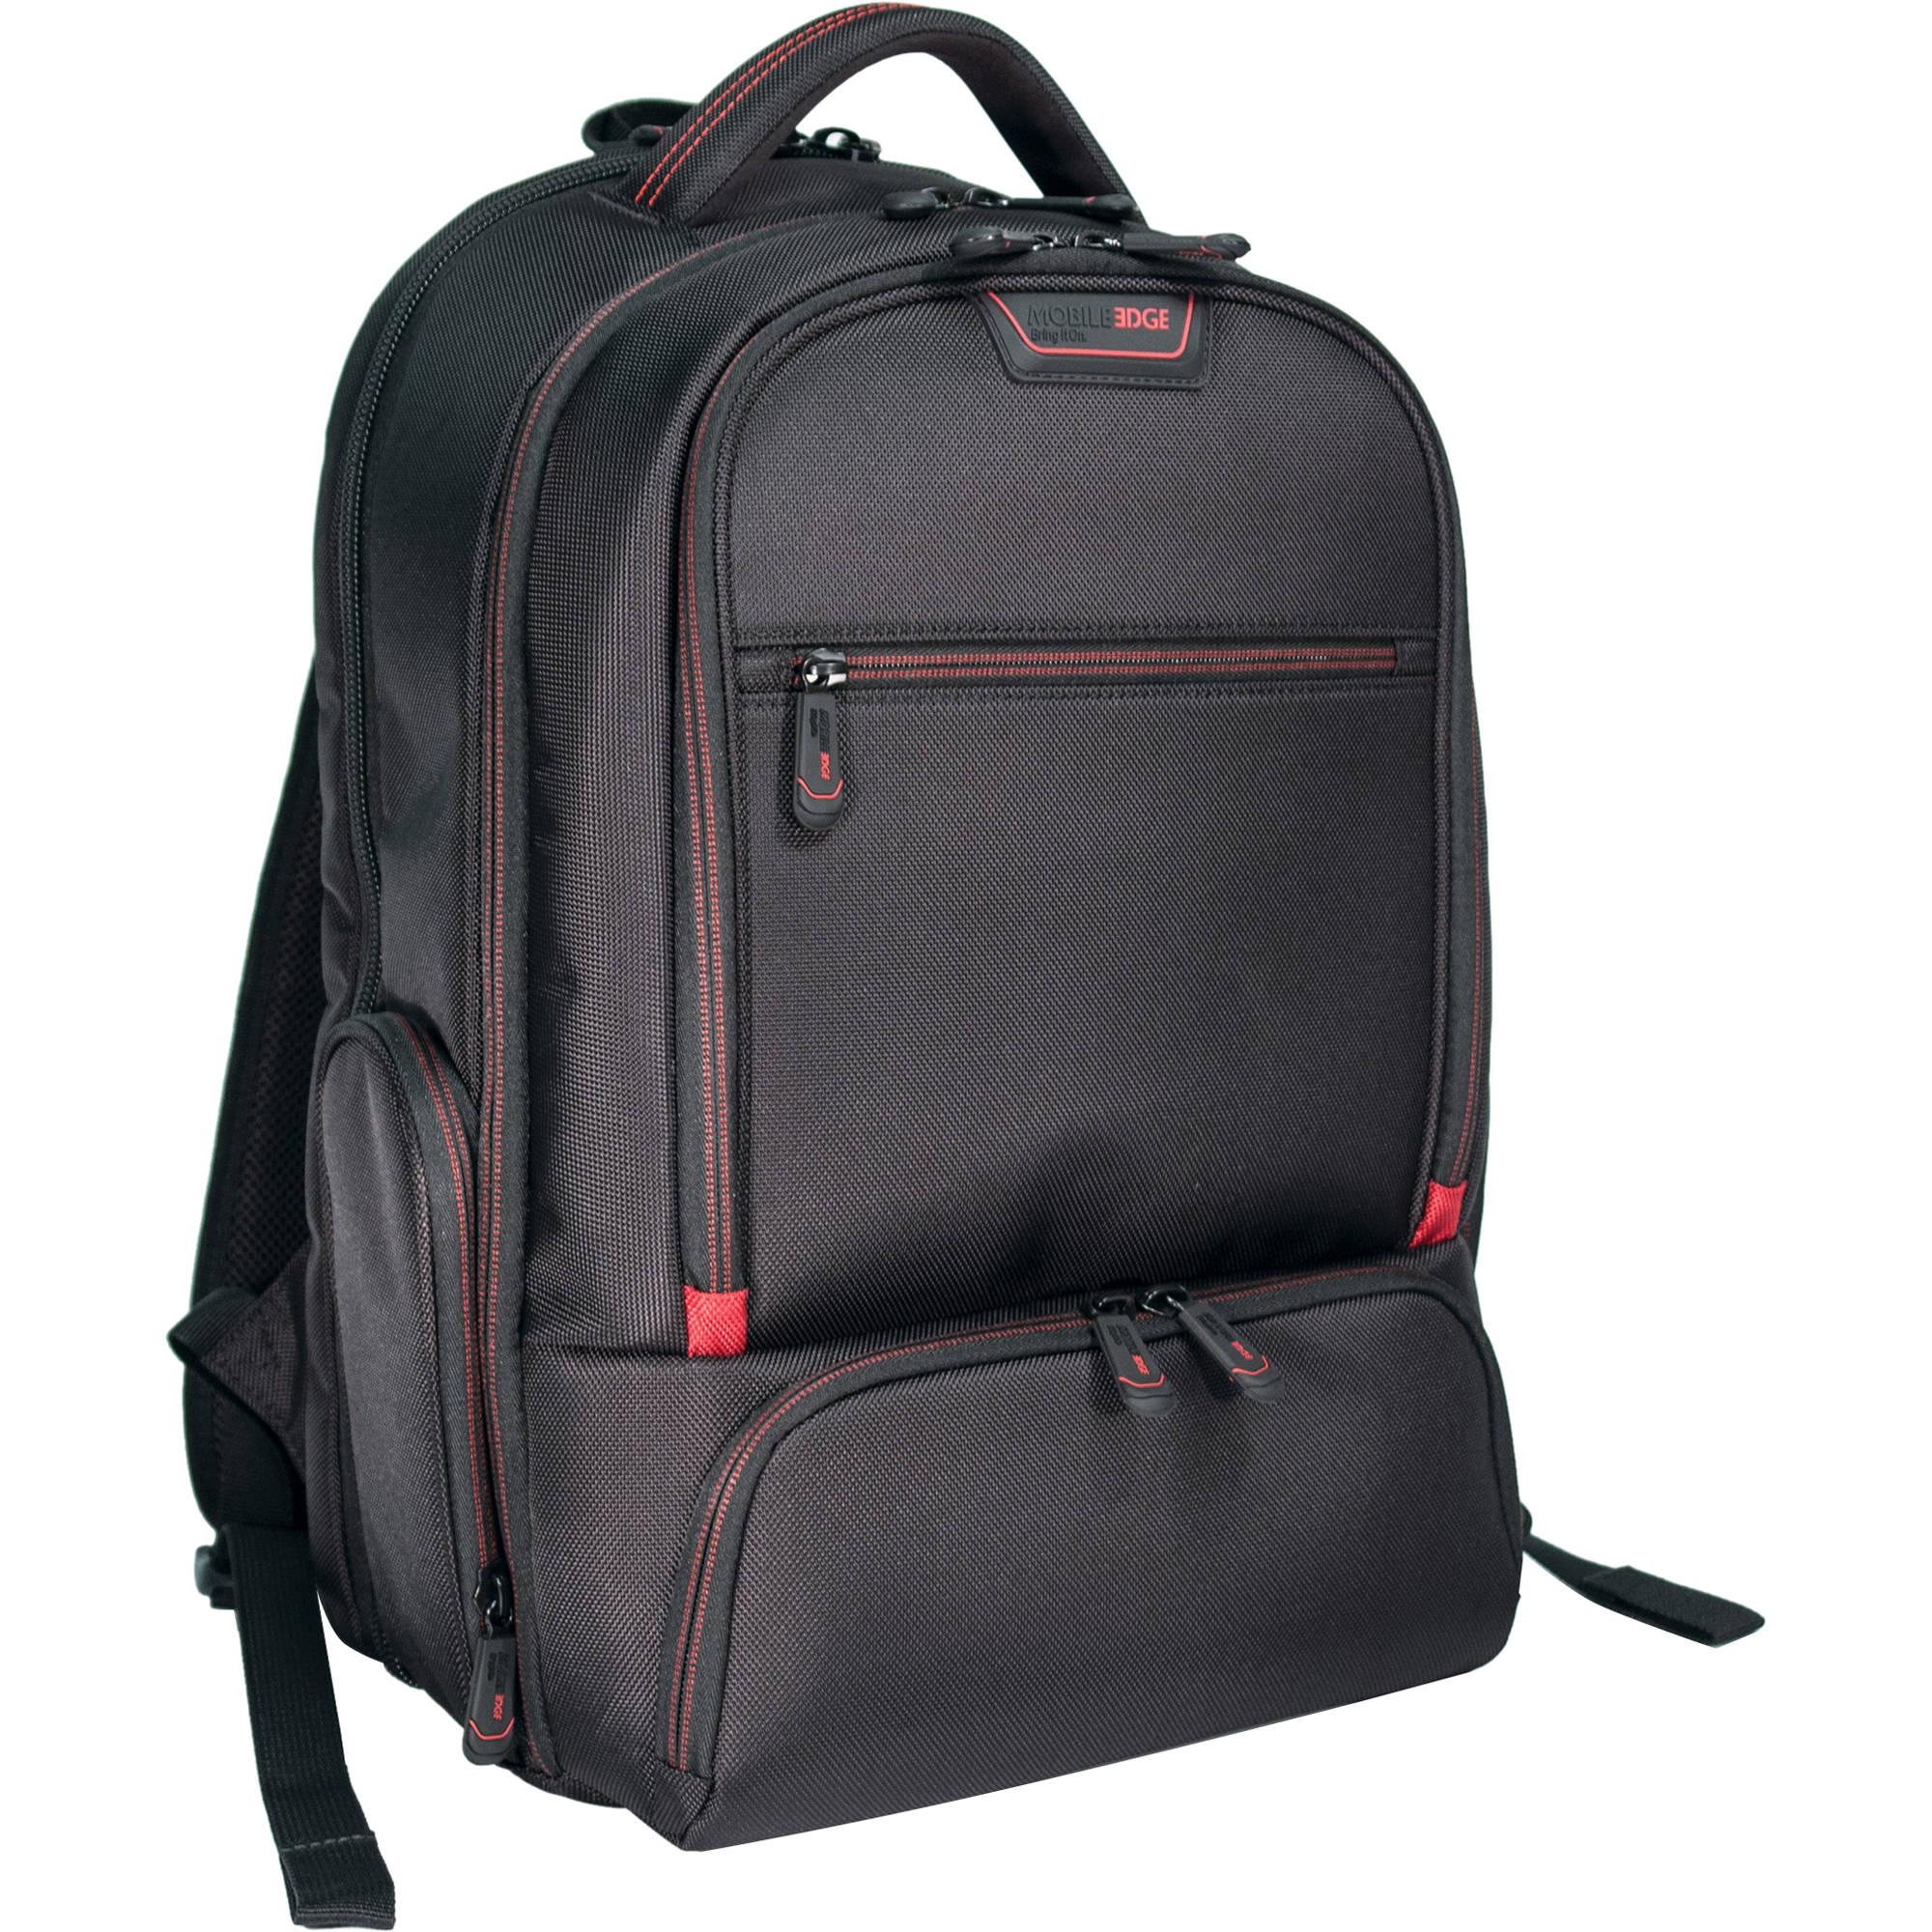 519d63559e9e Mobile Edge Professional Backpack for 16